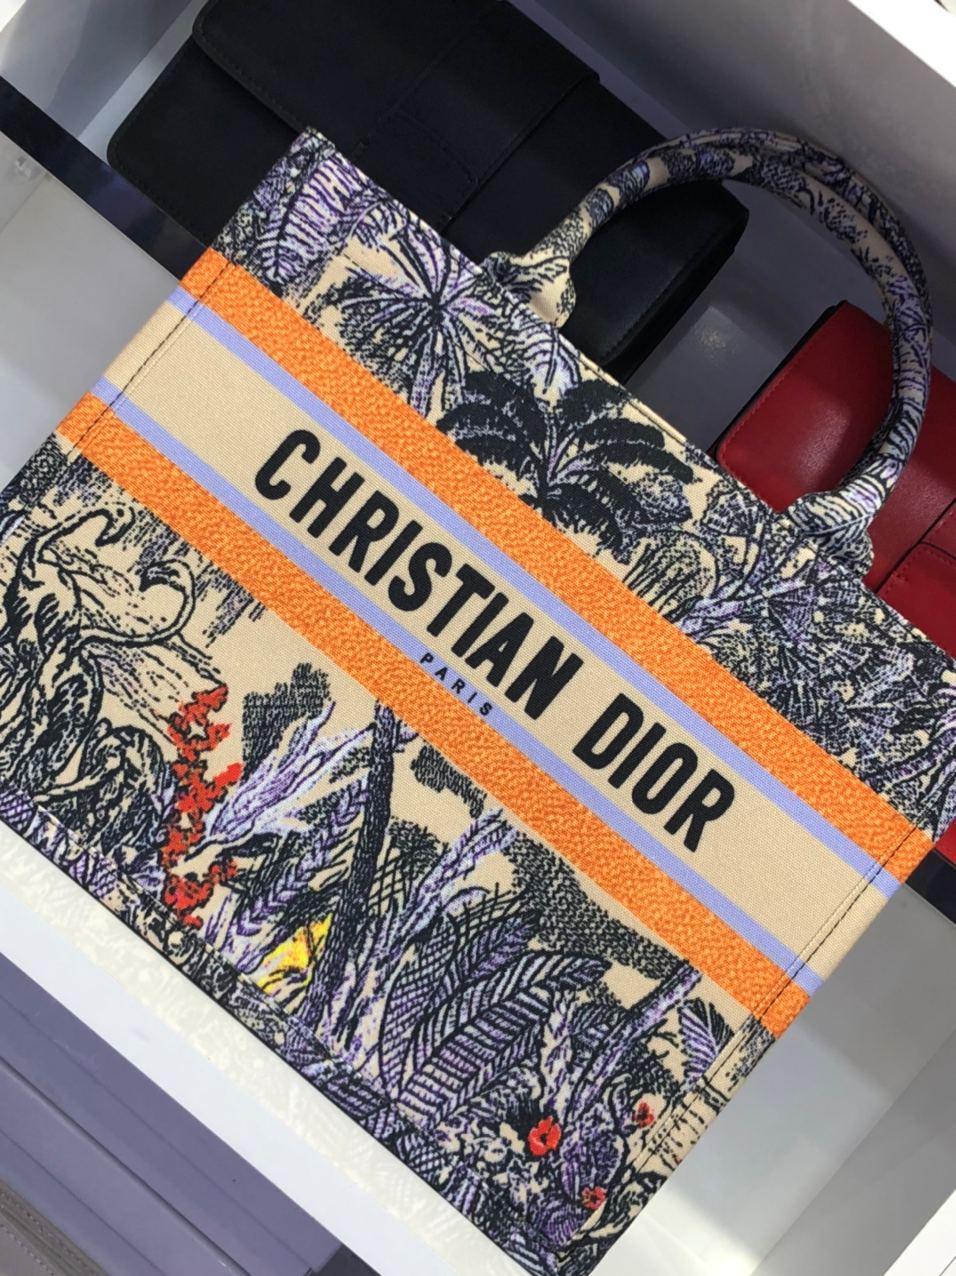 Sac Dior Book Tote